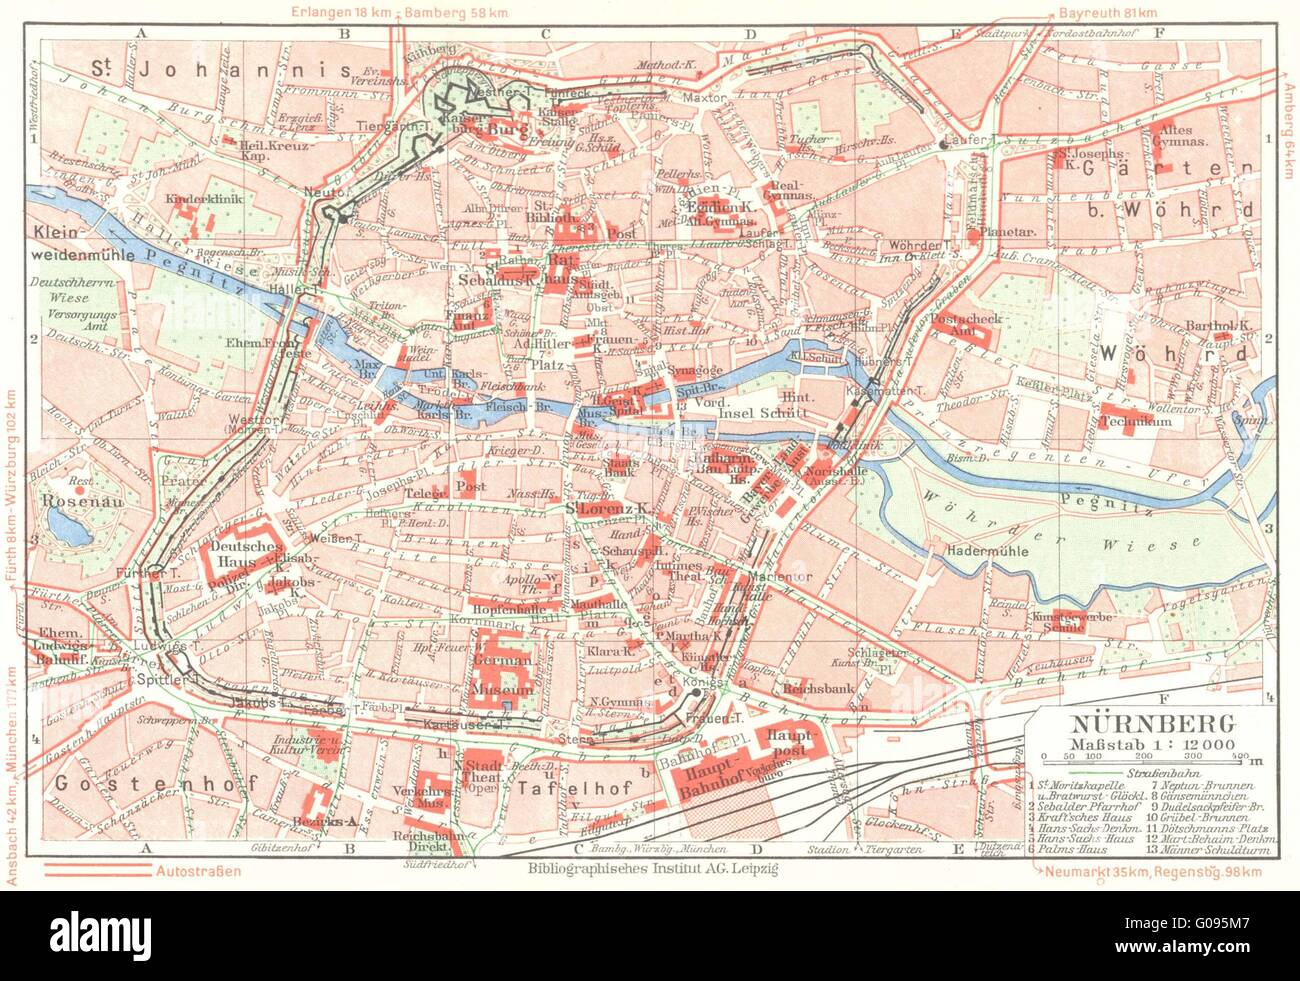 GERMANY NuremburgNurnberg Vintage Map Stock Photo - Germany map nurnberg